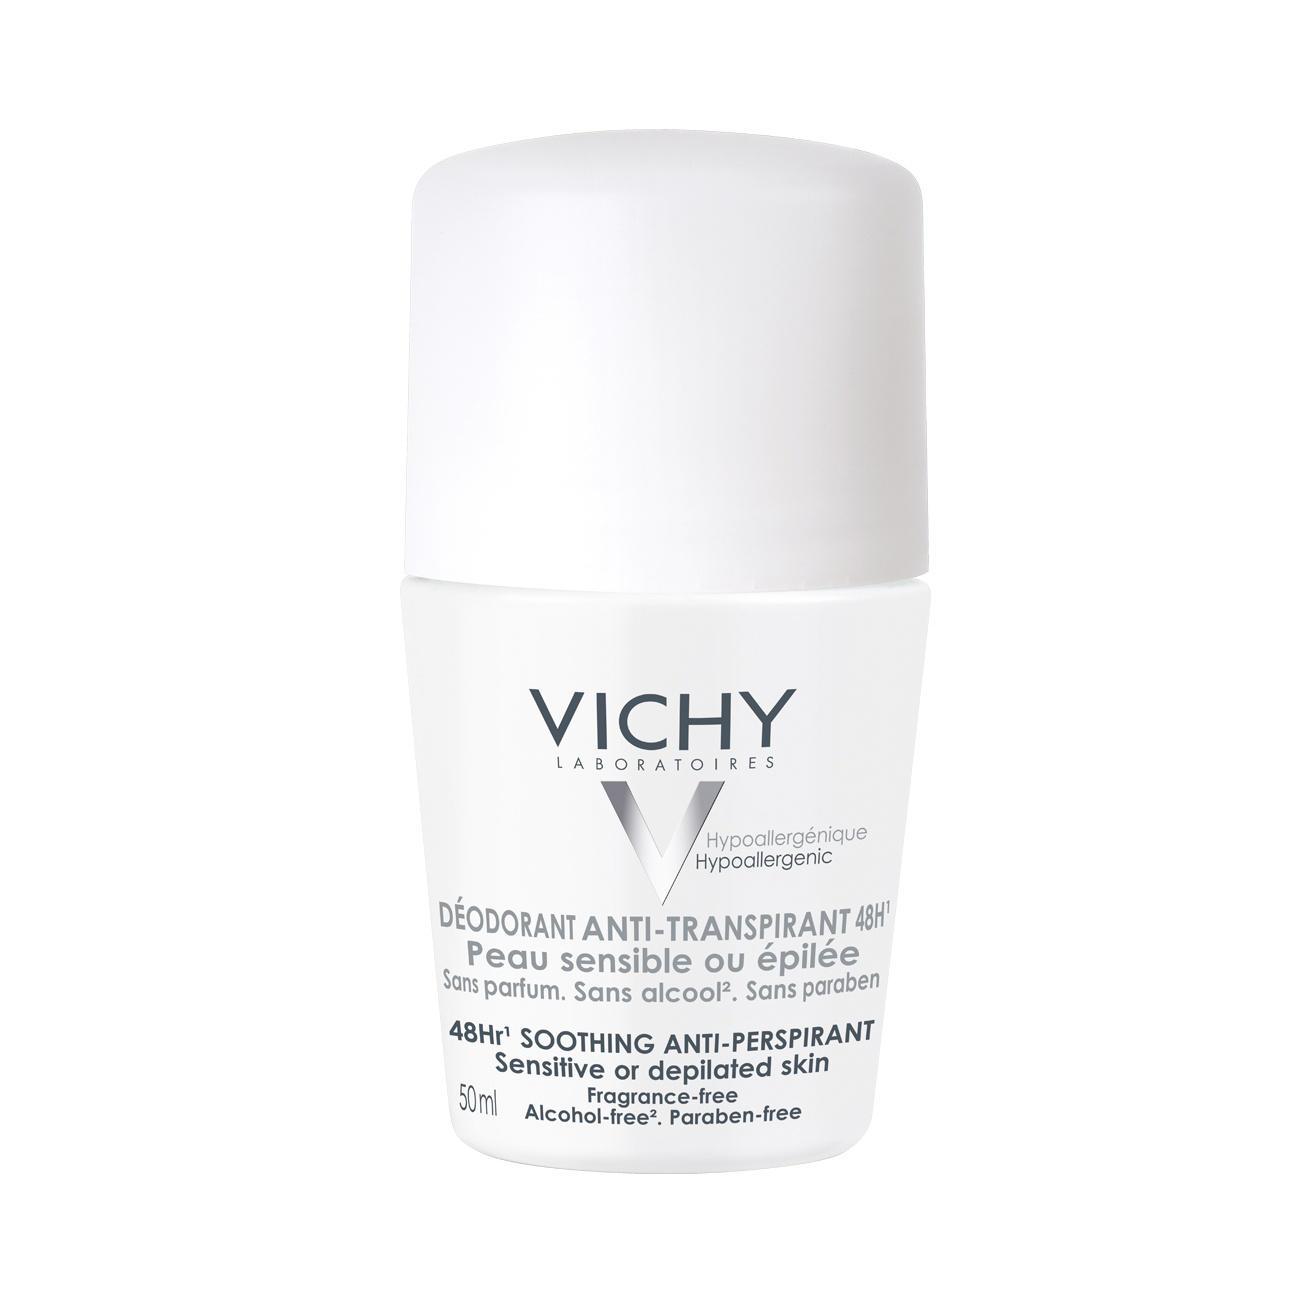 Vichy Deodorant 48 Hour Roll On Sensitive Skin